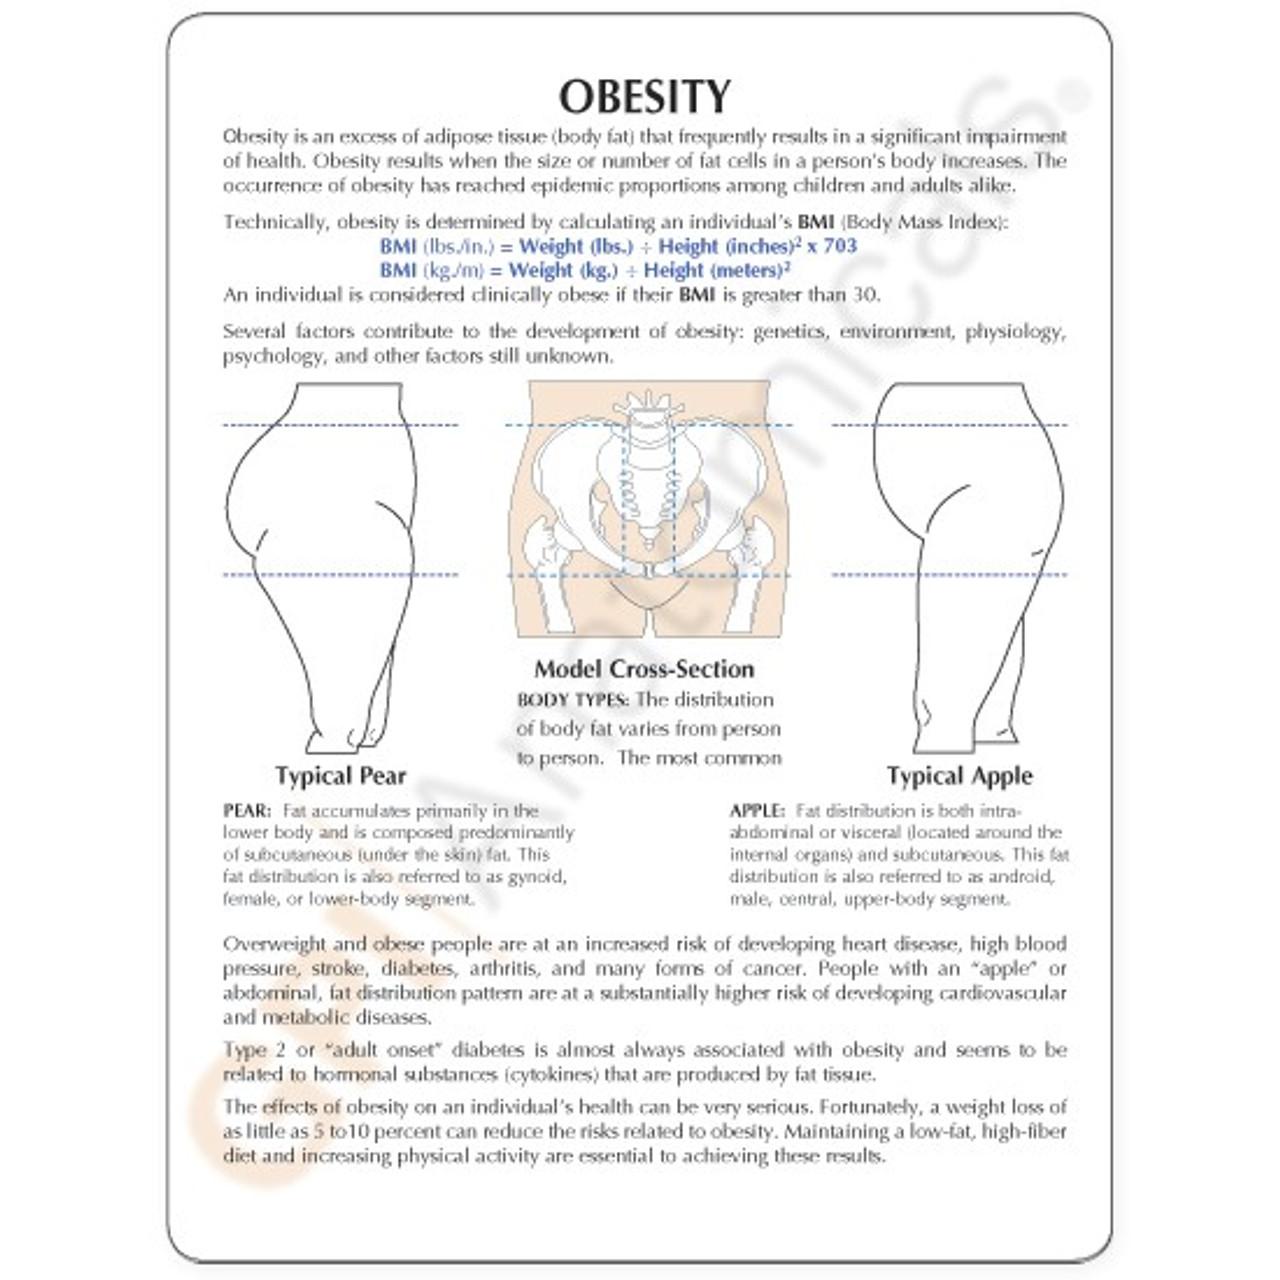 Obesity Anatomical Model Description Card